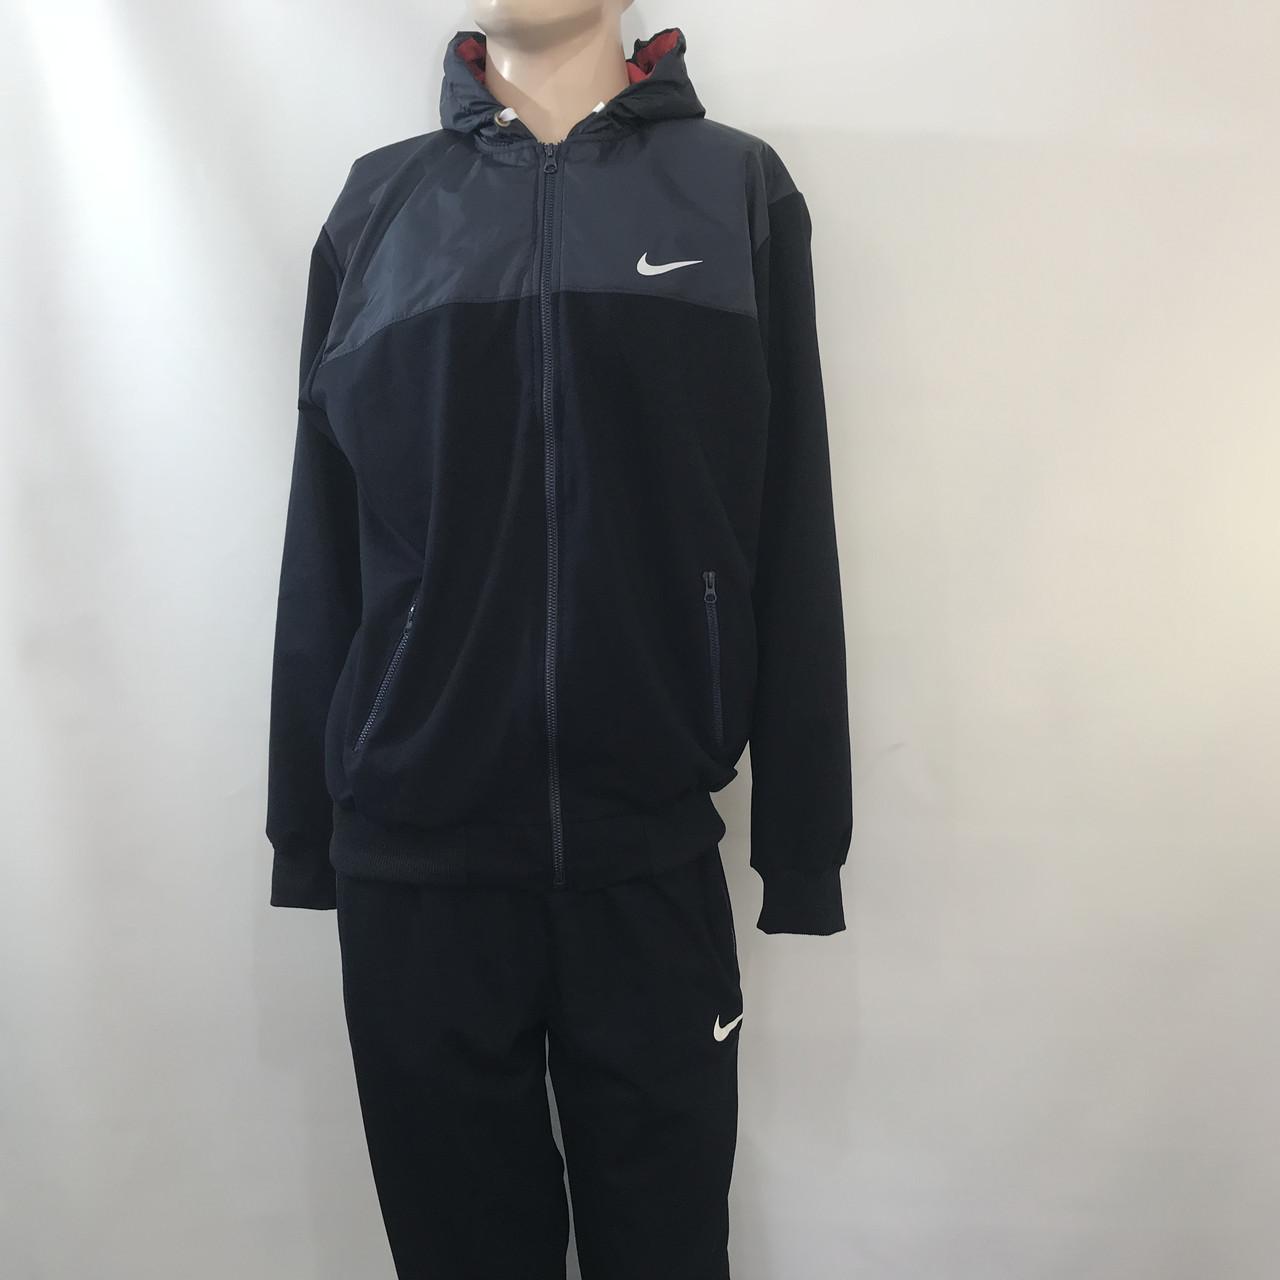 Мужской спортивный костюм Nike (большой размер) / темно синий/ р.56-62